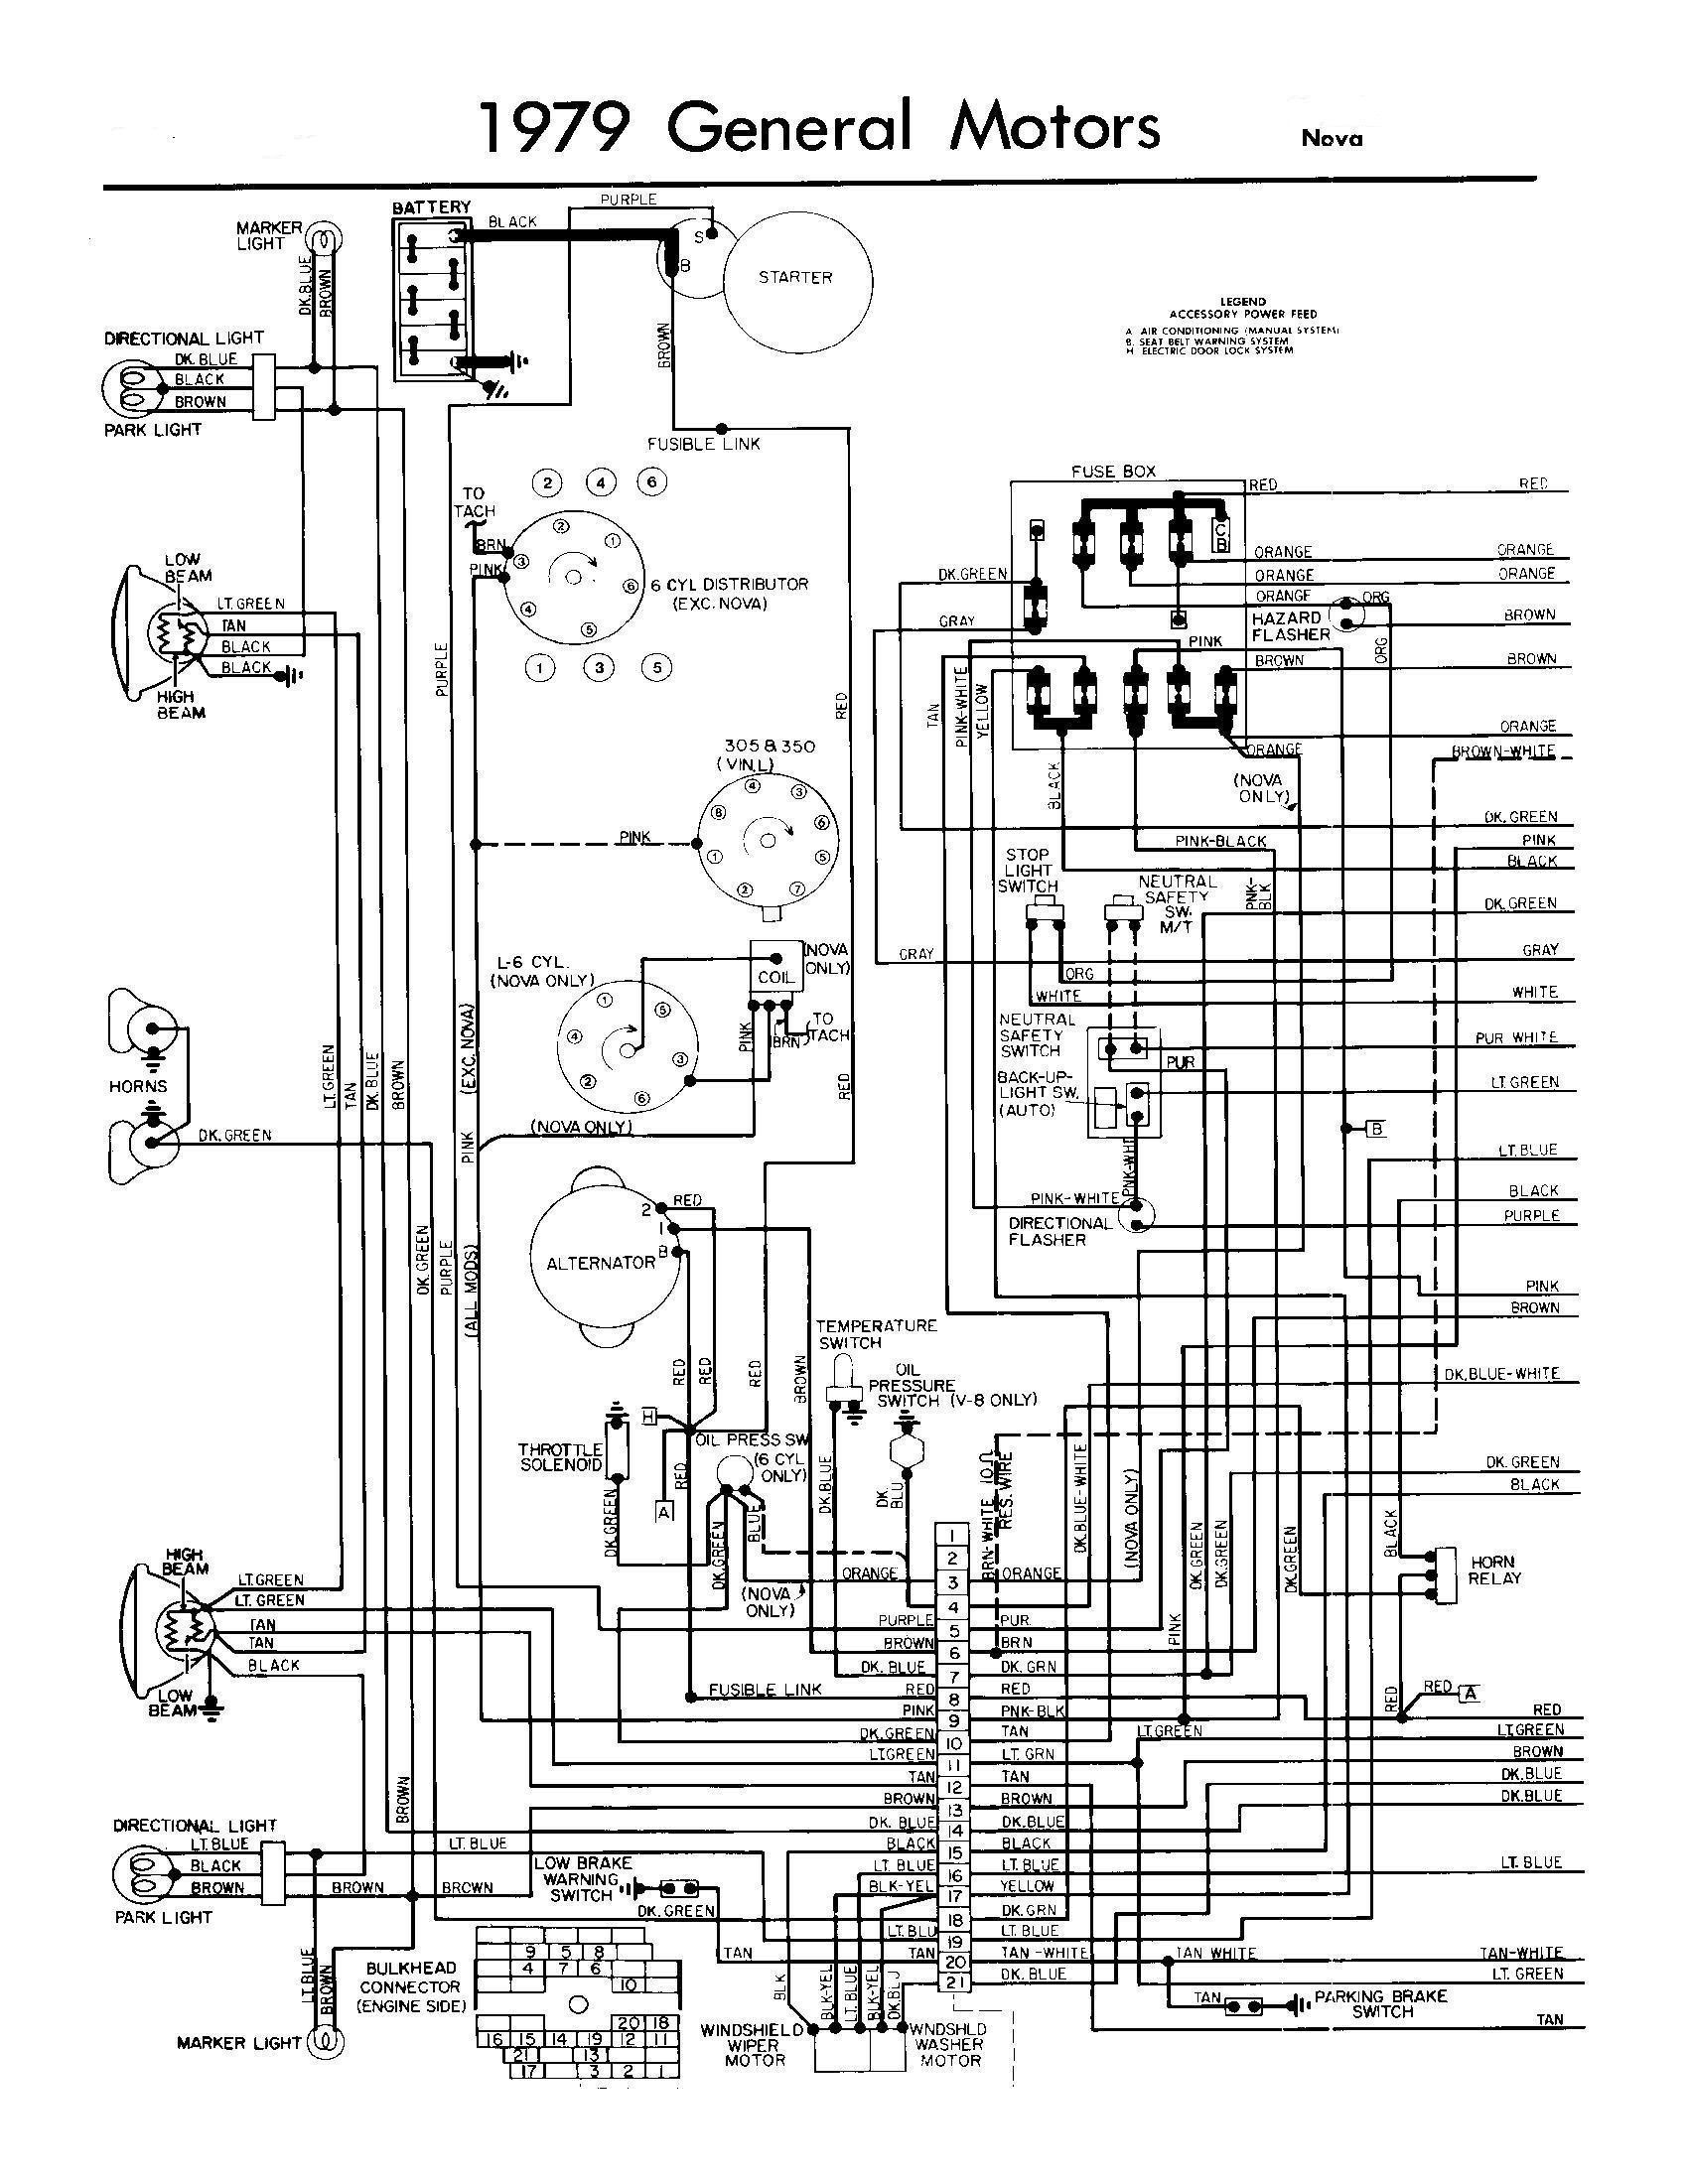 69 Camaro Wiring Diagram 84 Camaro Wiring Harness Experts Wiring Diagram • Of 69 Camaro Wiring Diagram